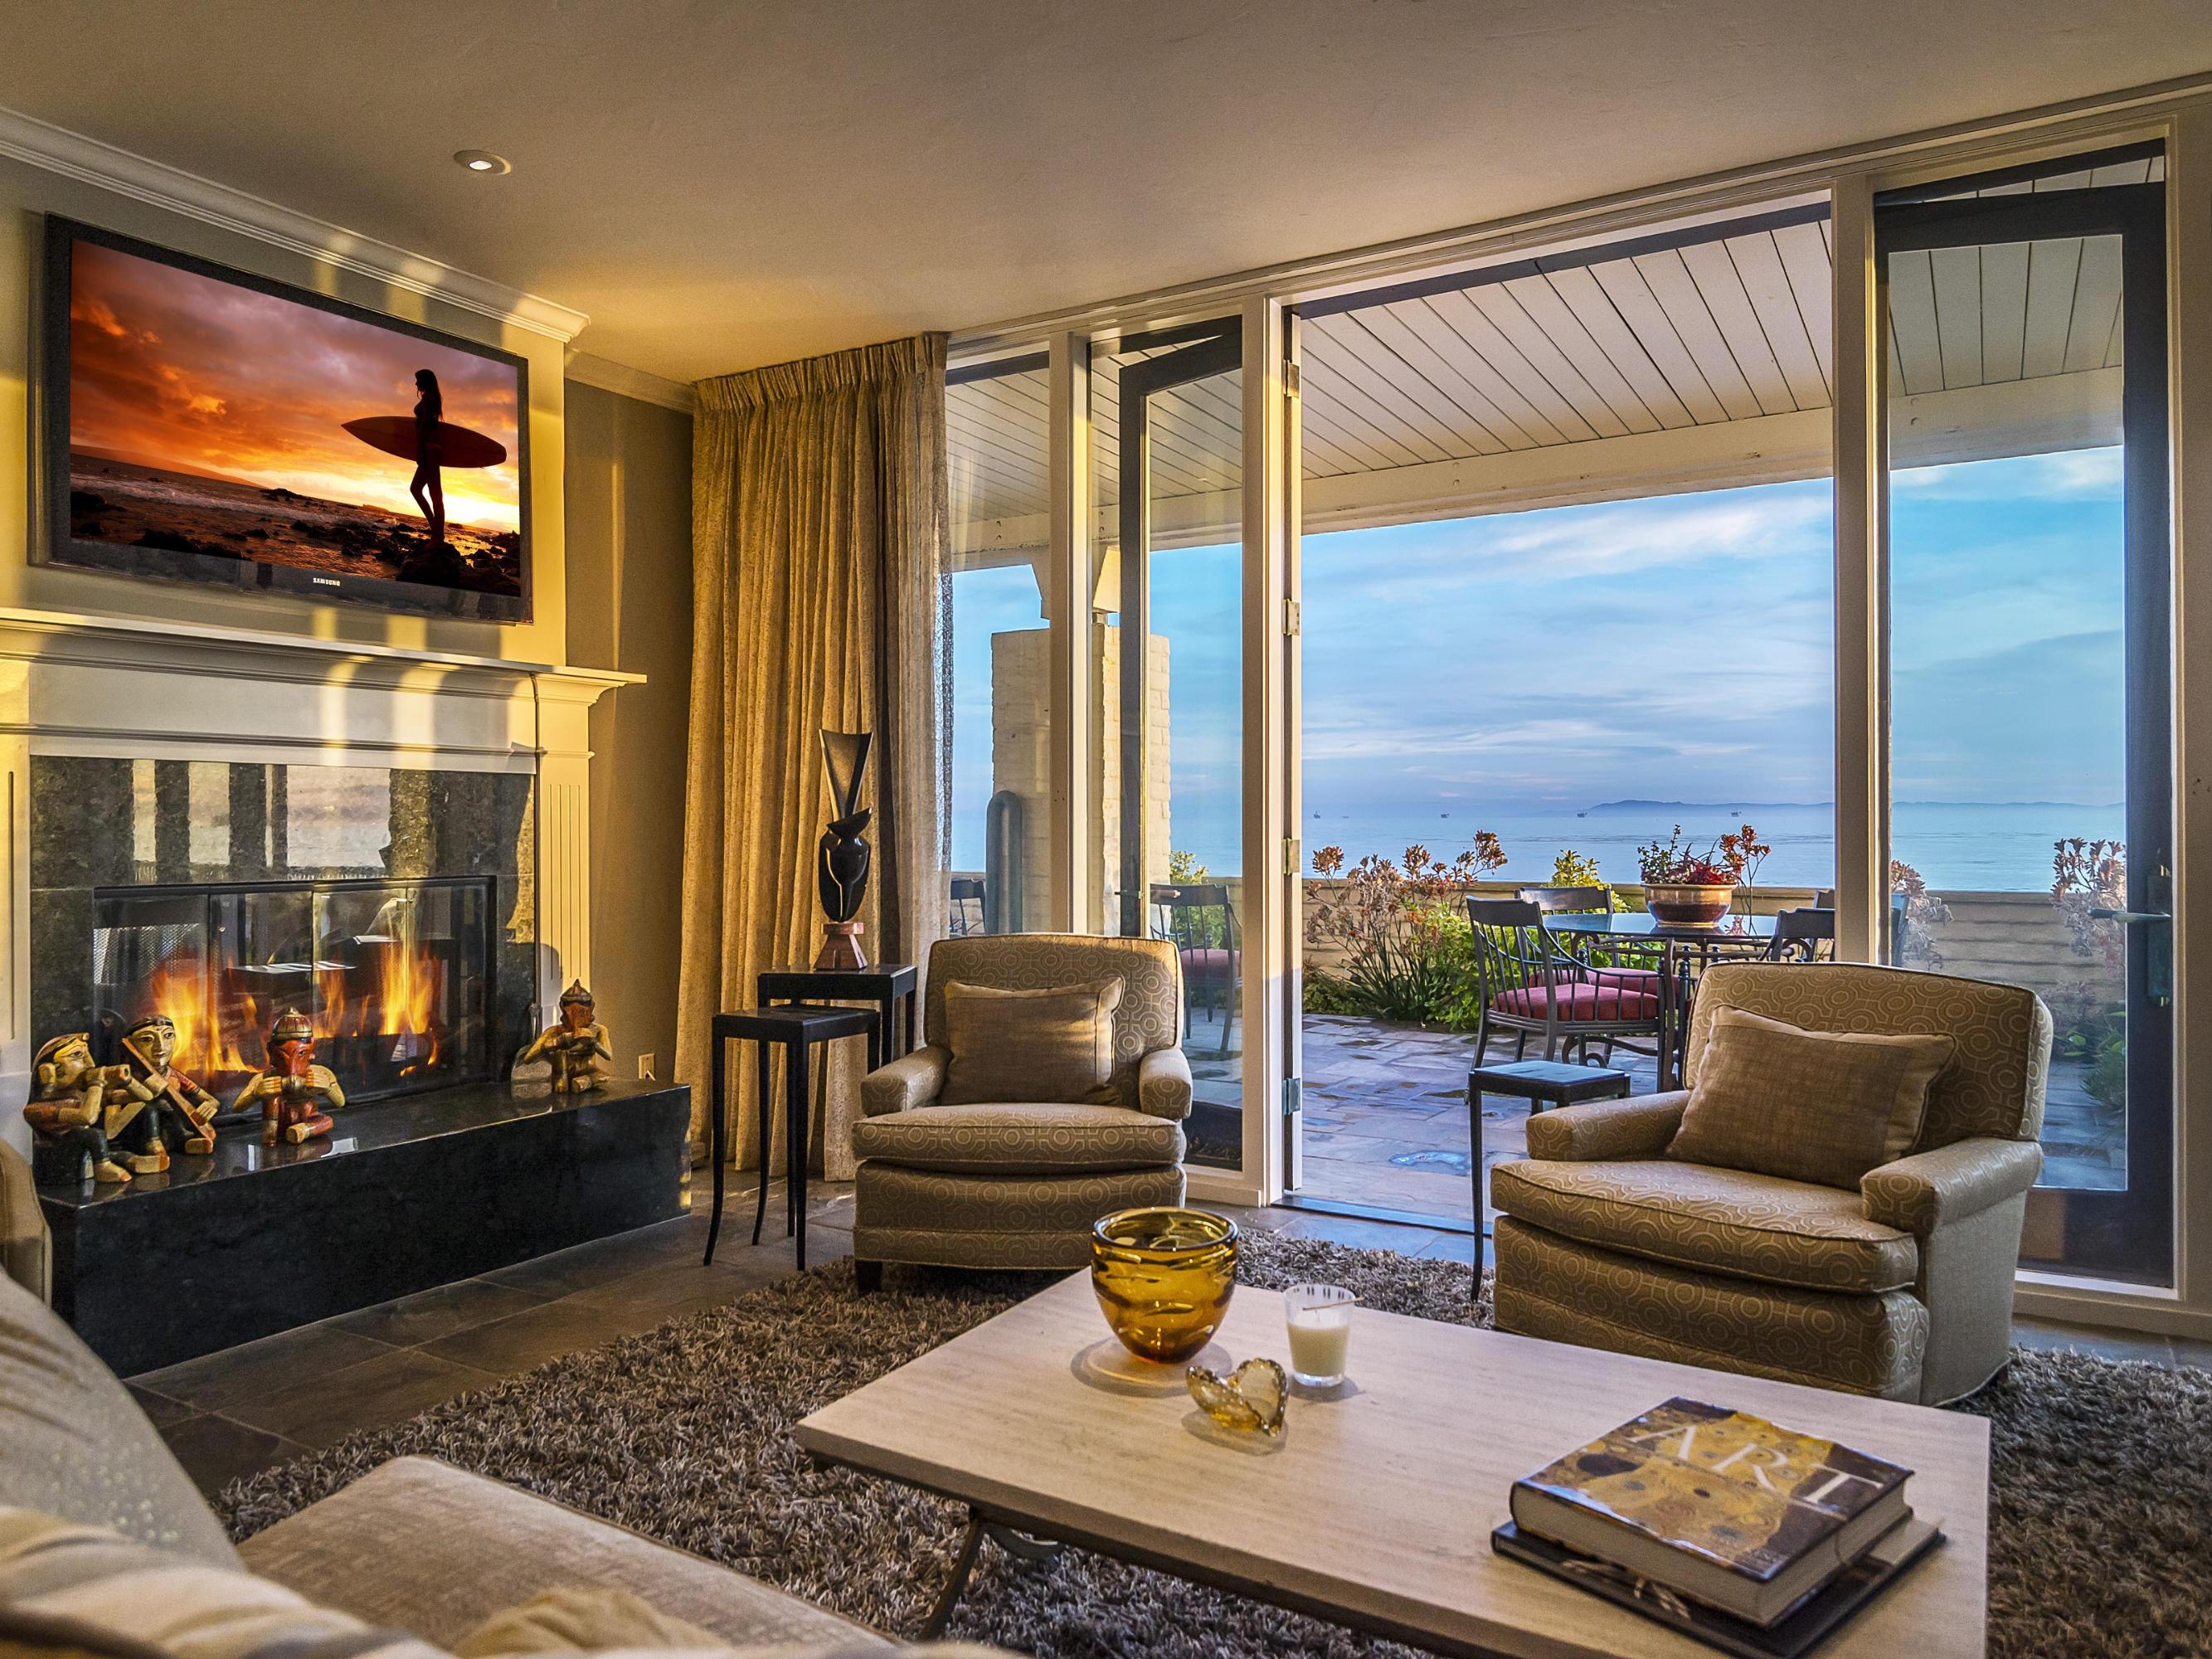 Property photo for 1367 Plaza Pacifica Santa Barbara, California 93108 - 14-1451